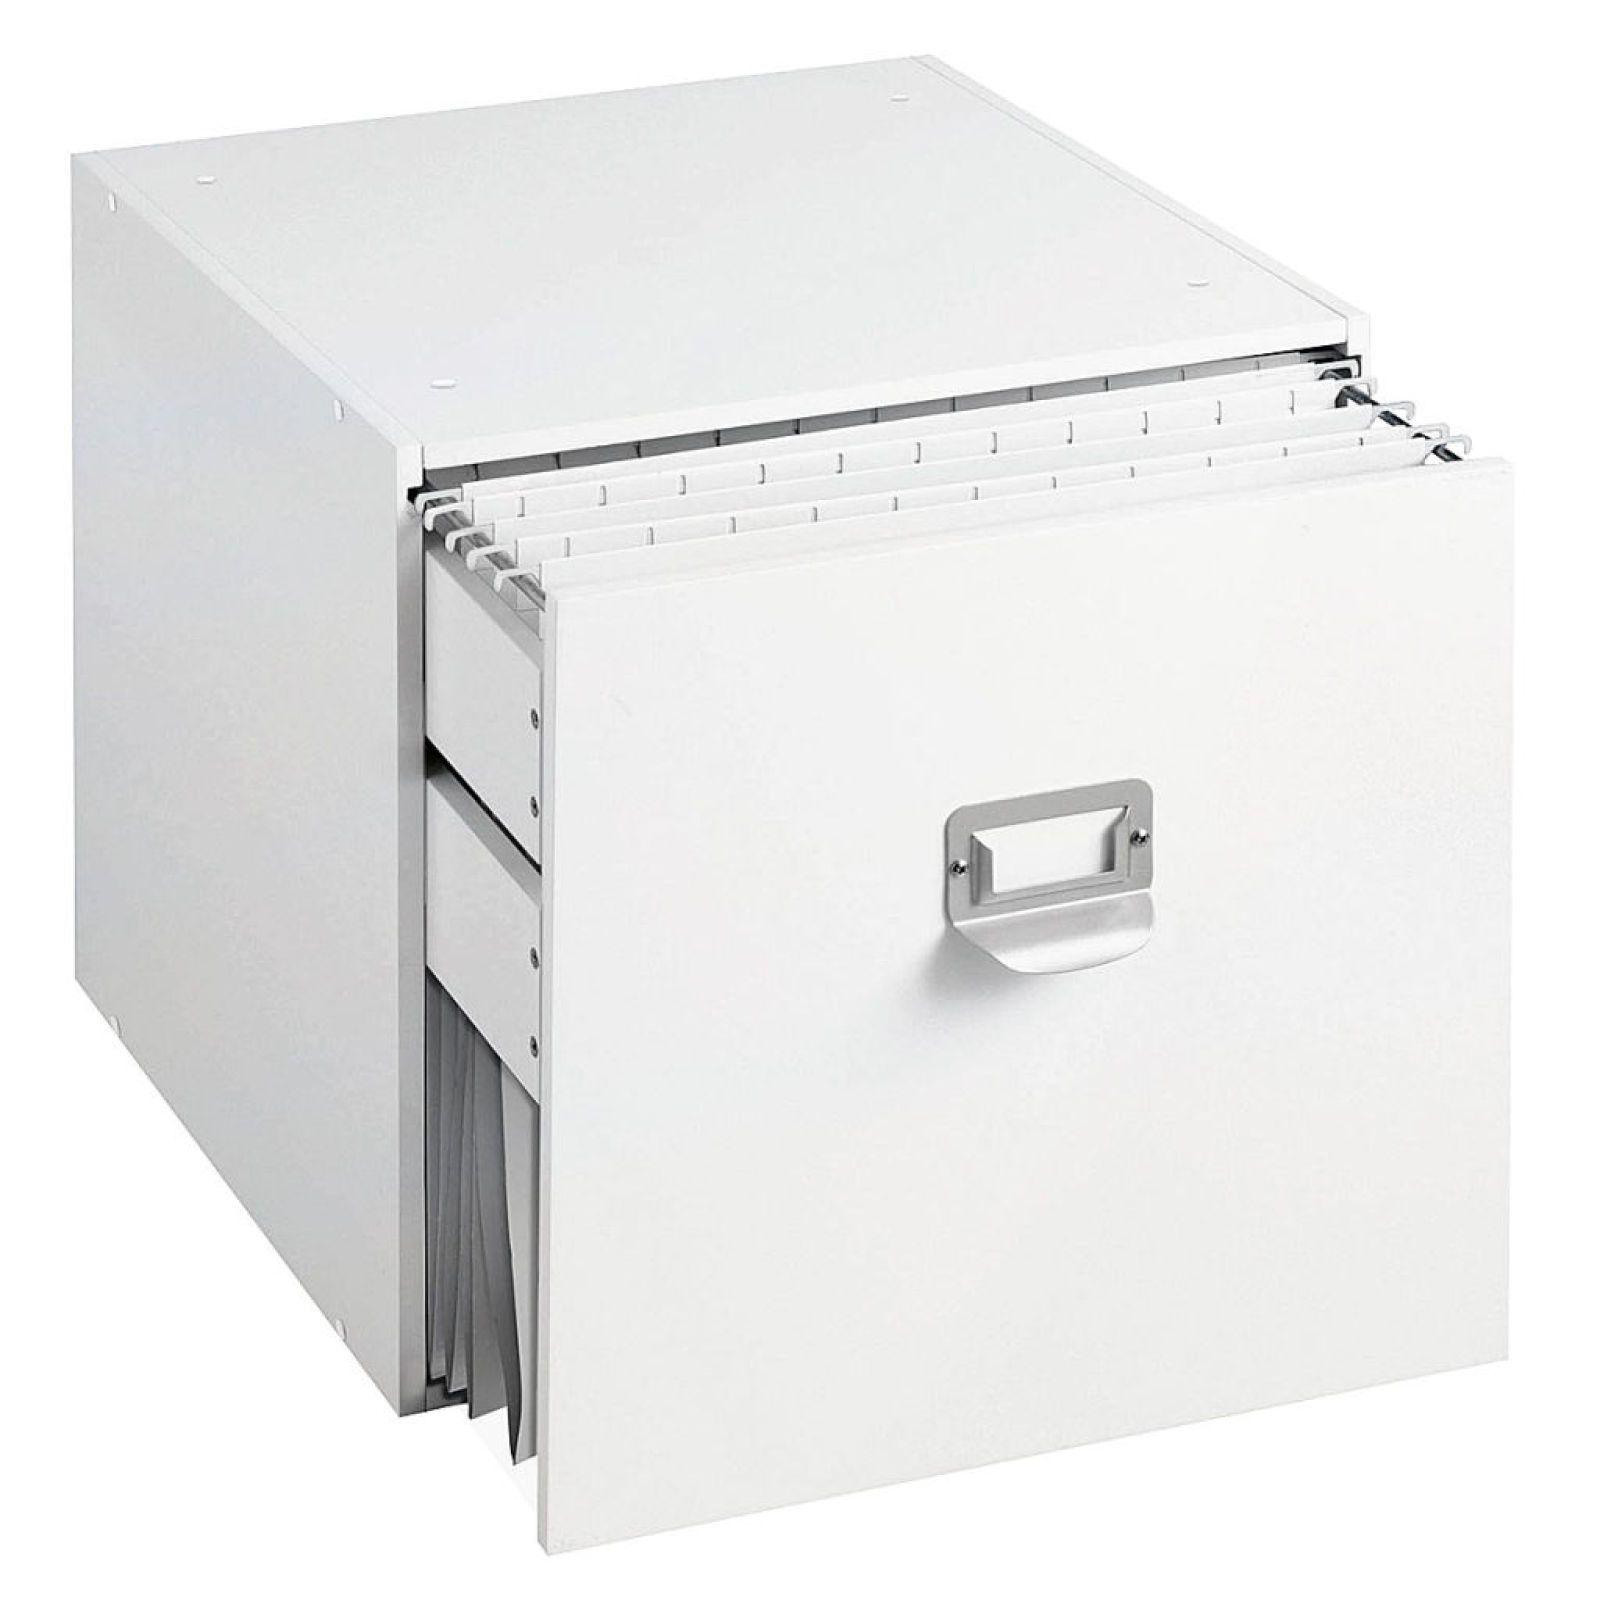 Recollections Hanging File Cube Hanging File Organizer Paper Storage Scrapbook Storage